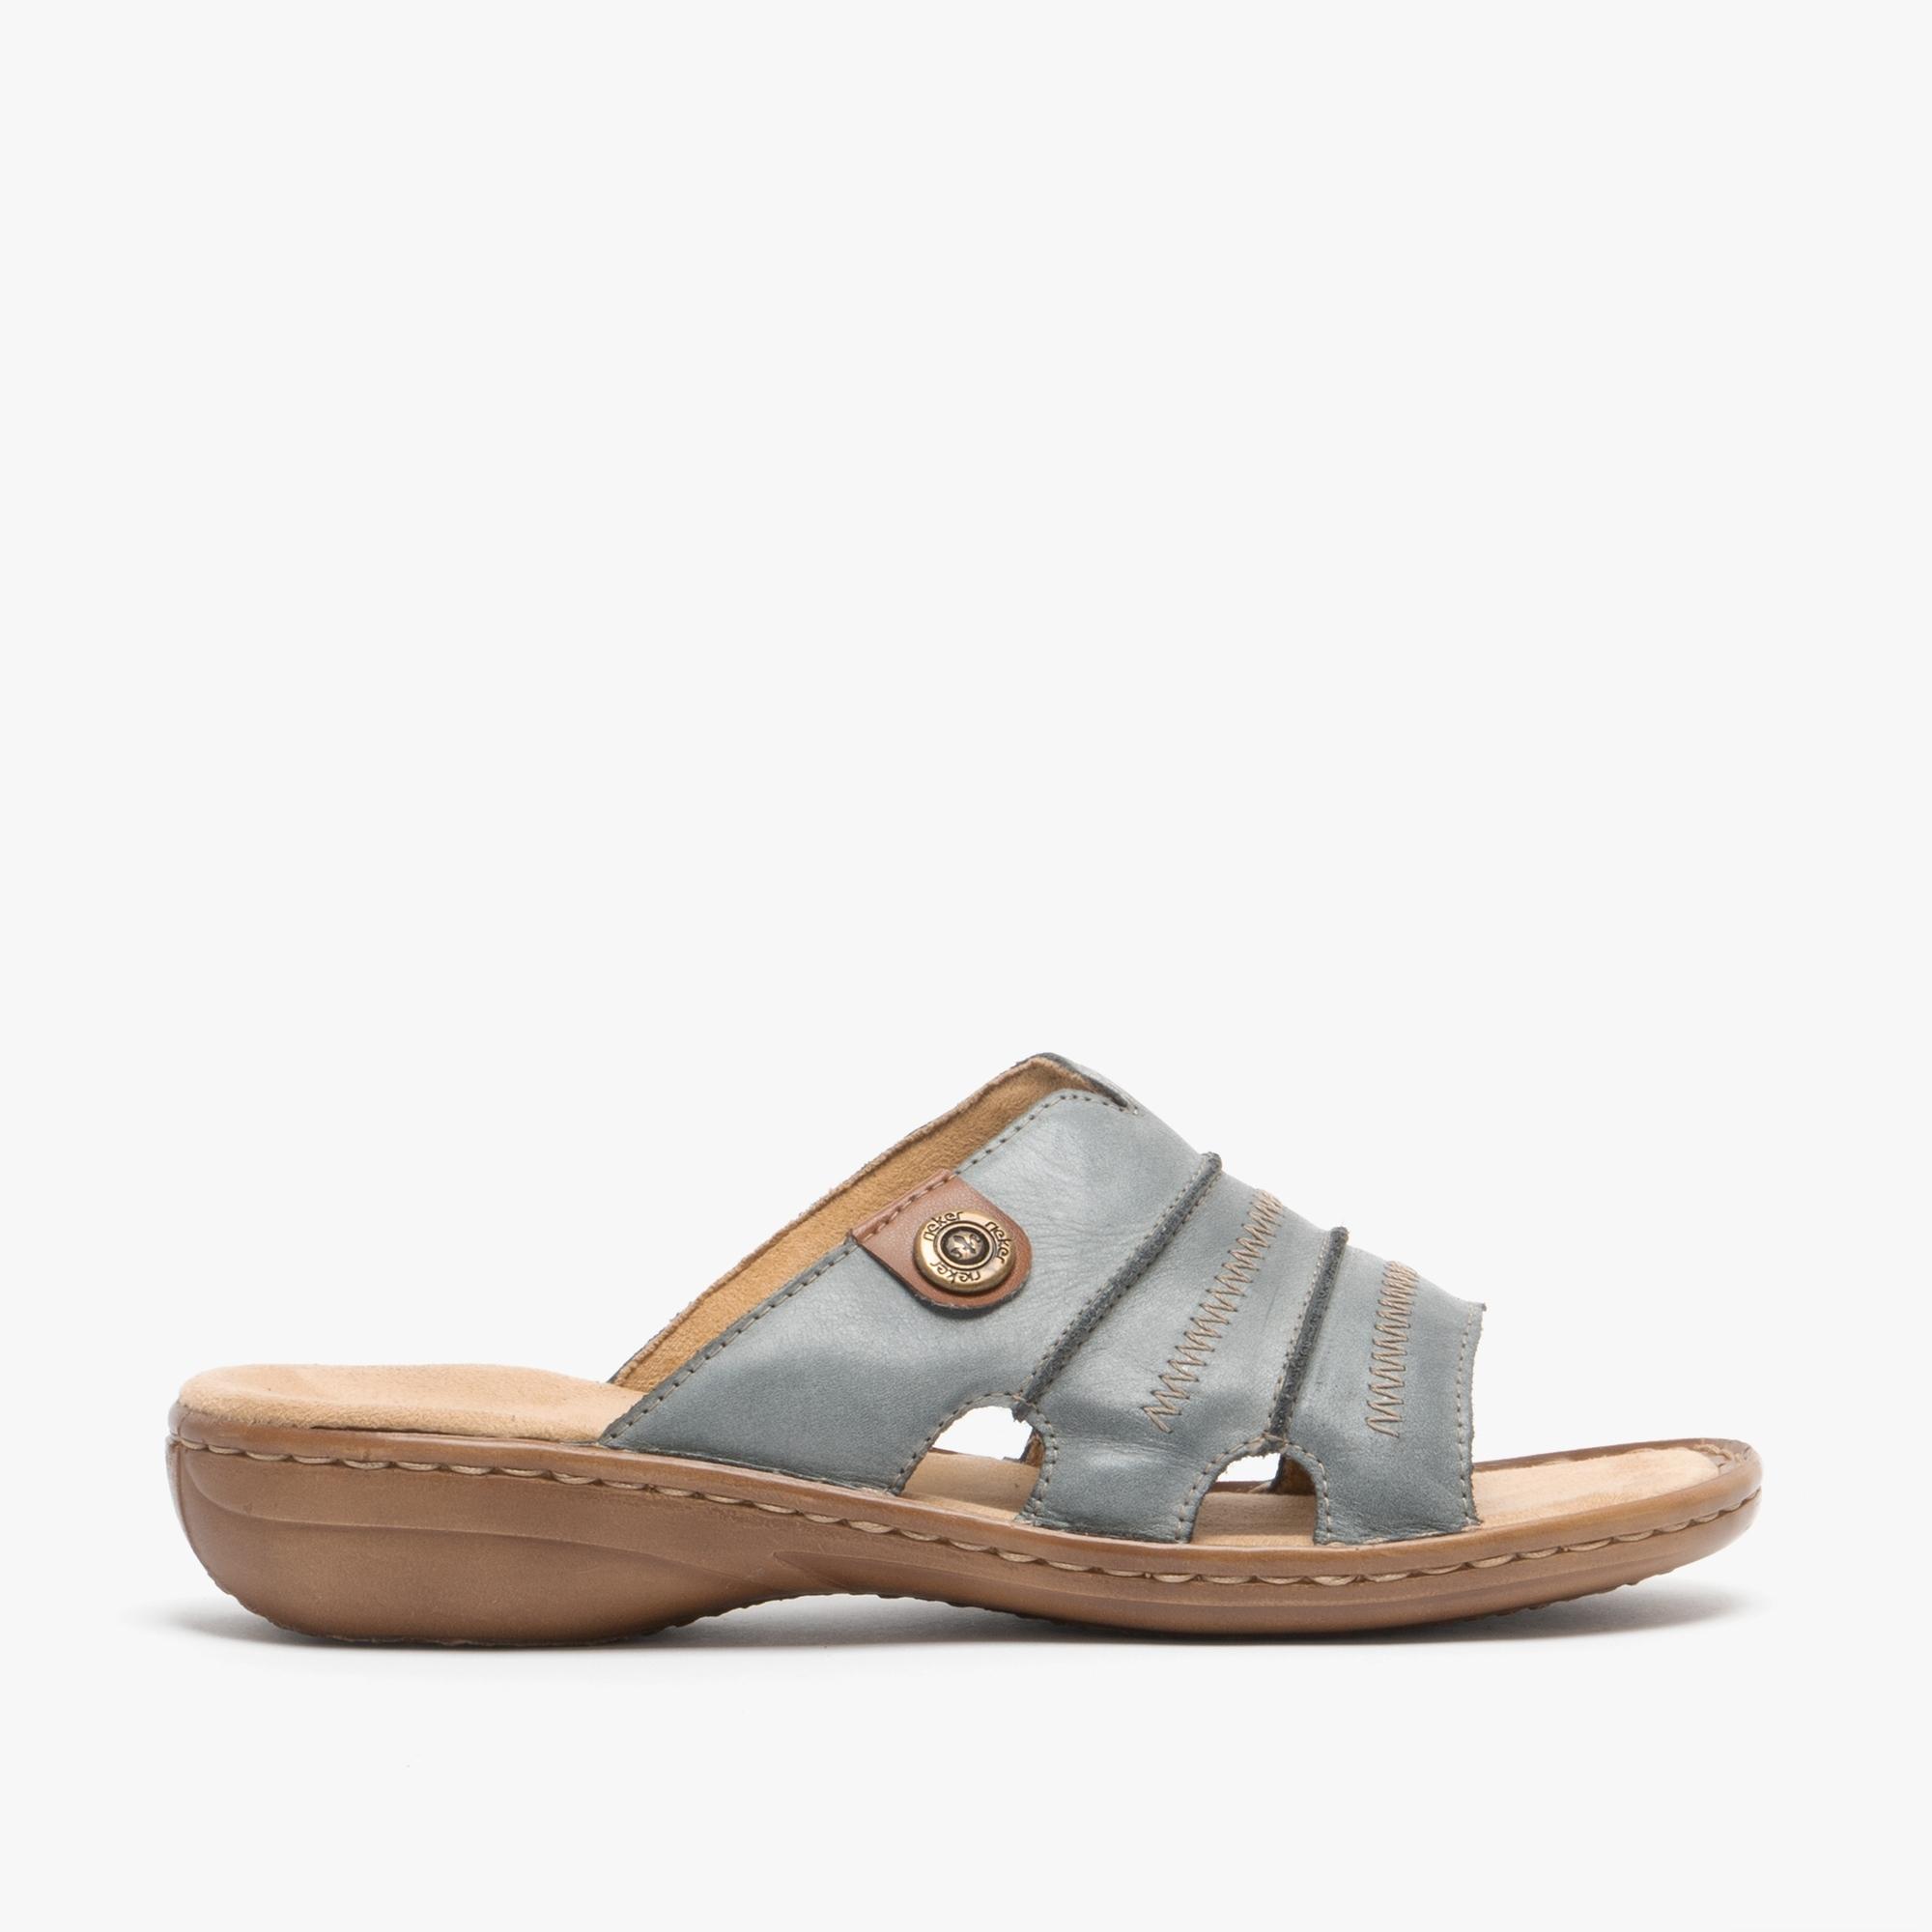 60876 Ladies Rieker Leather Open Toe Mule Sandals